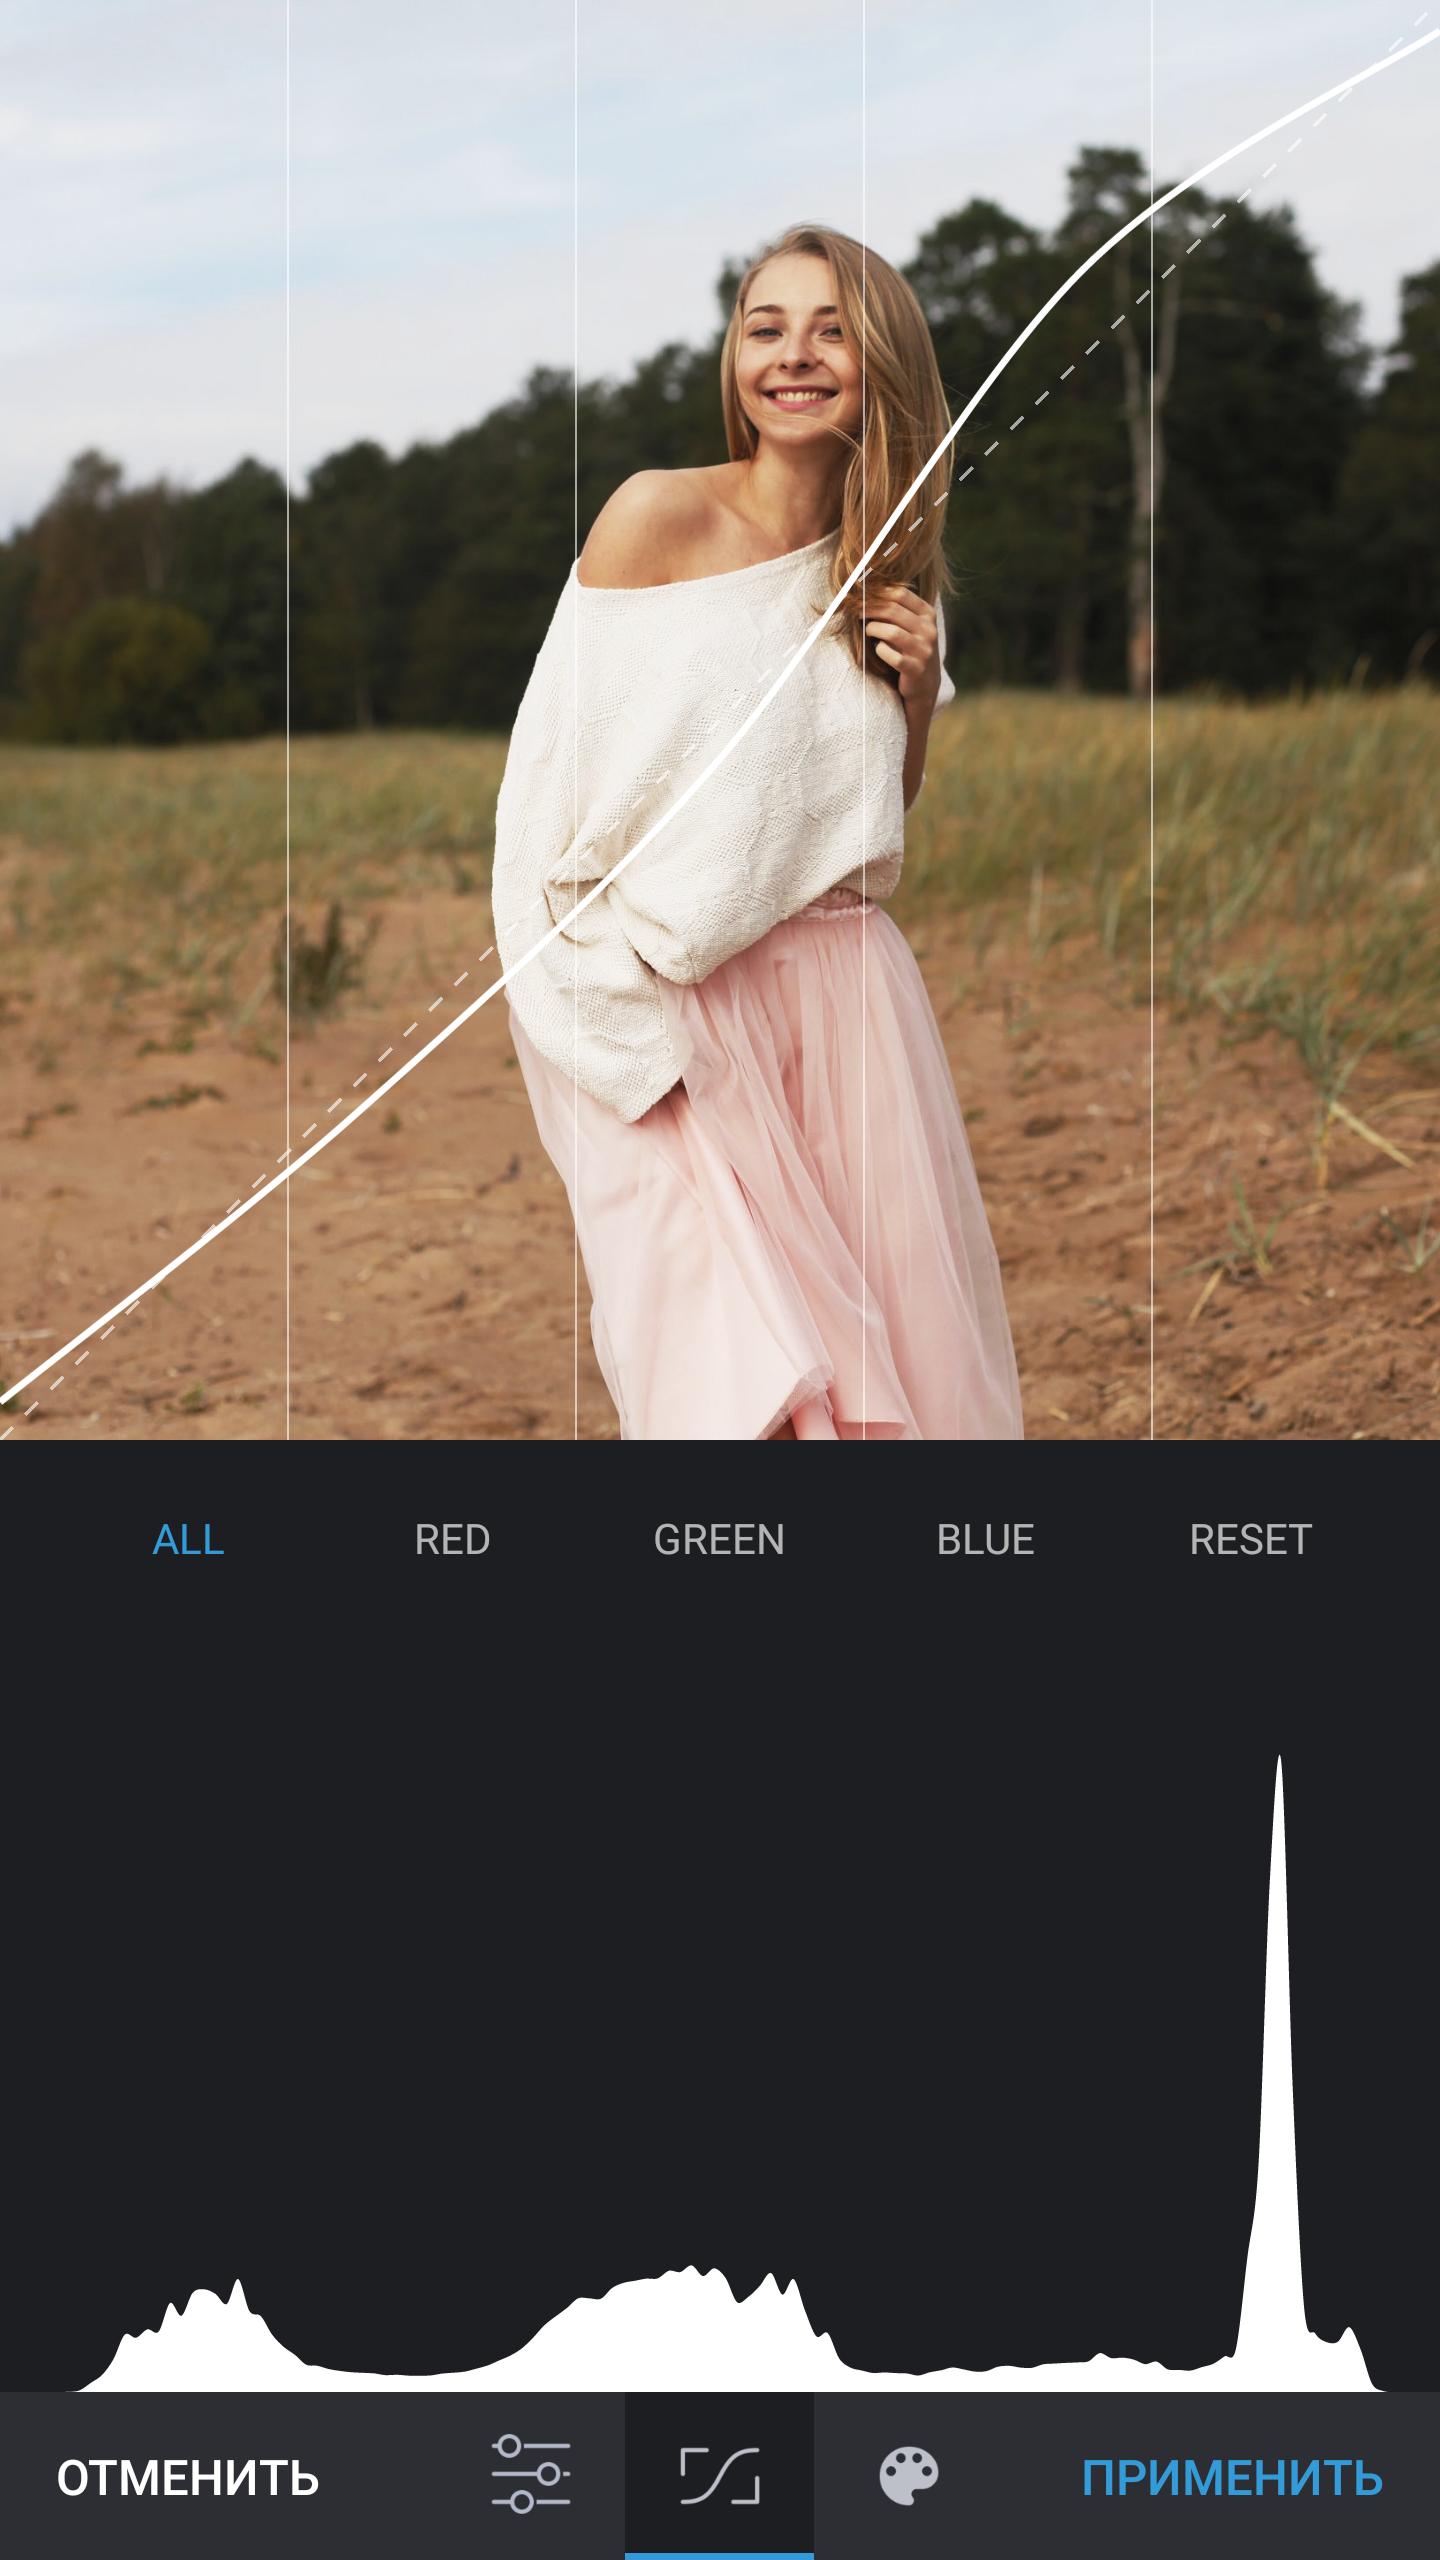 Android: эволюция фоторедактора ВКонтакте